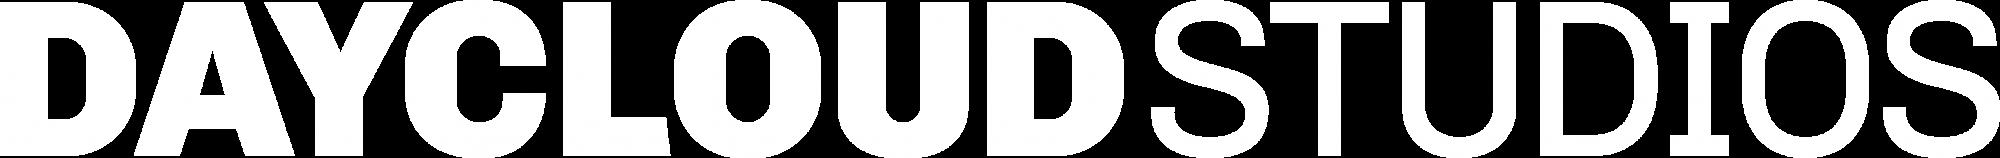 DayCloud Studios Logo